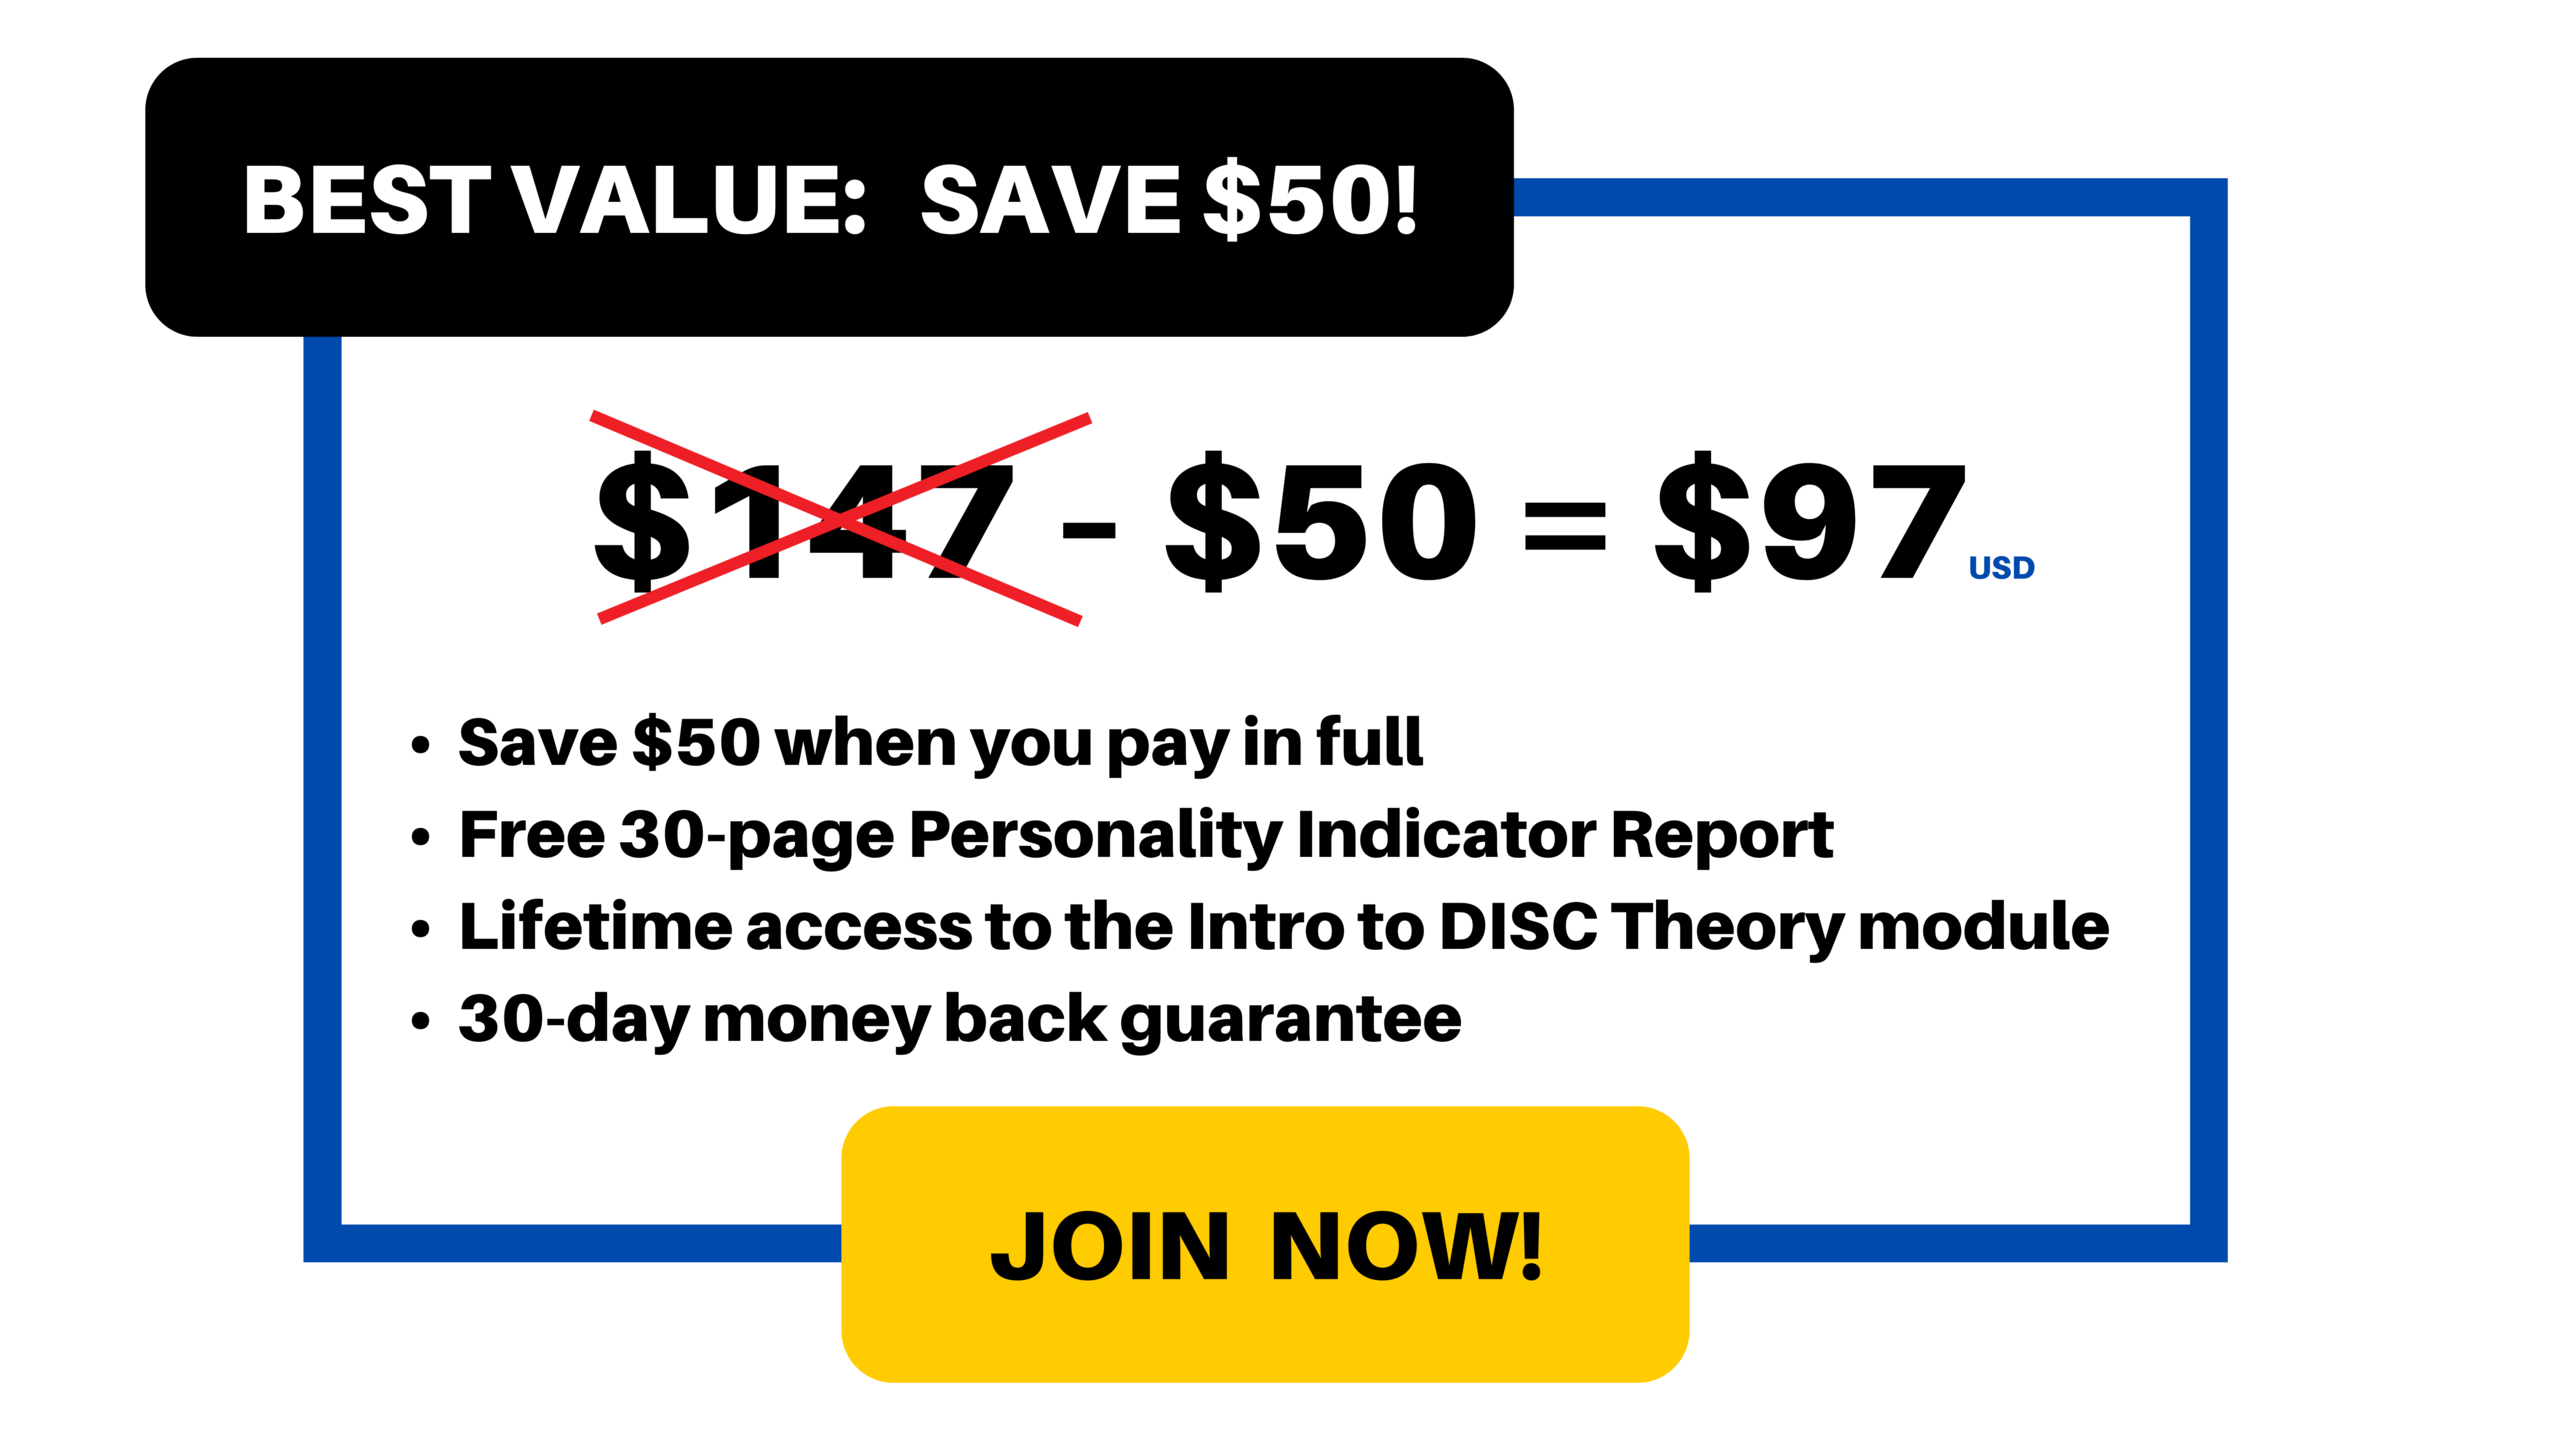 Best Value: $97